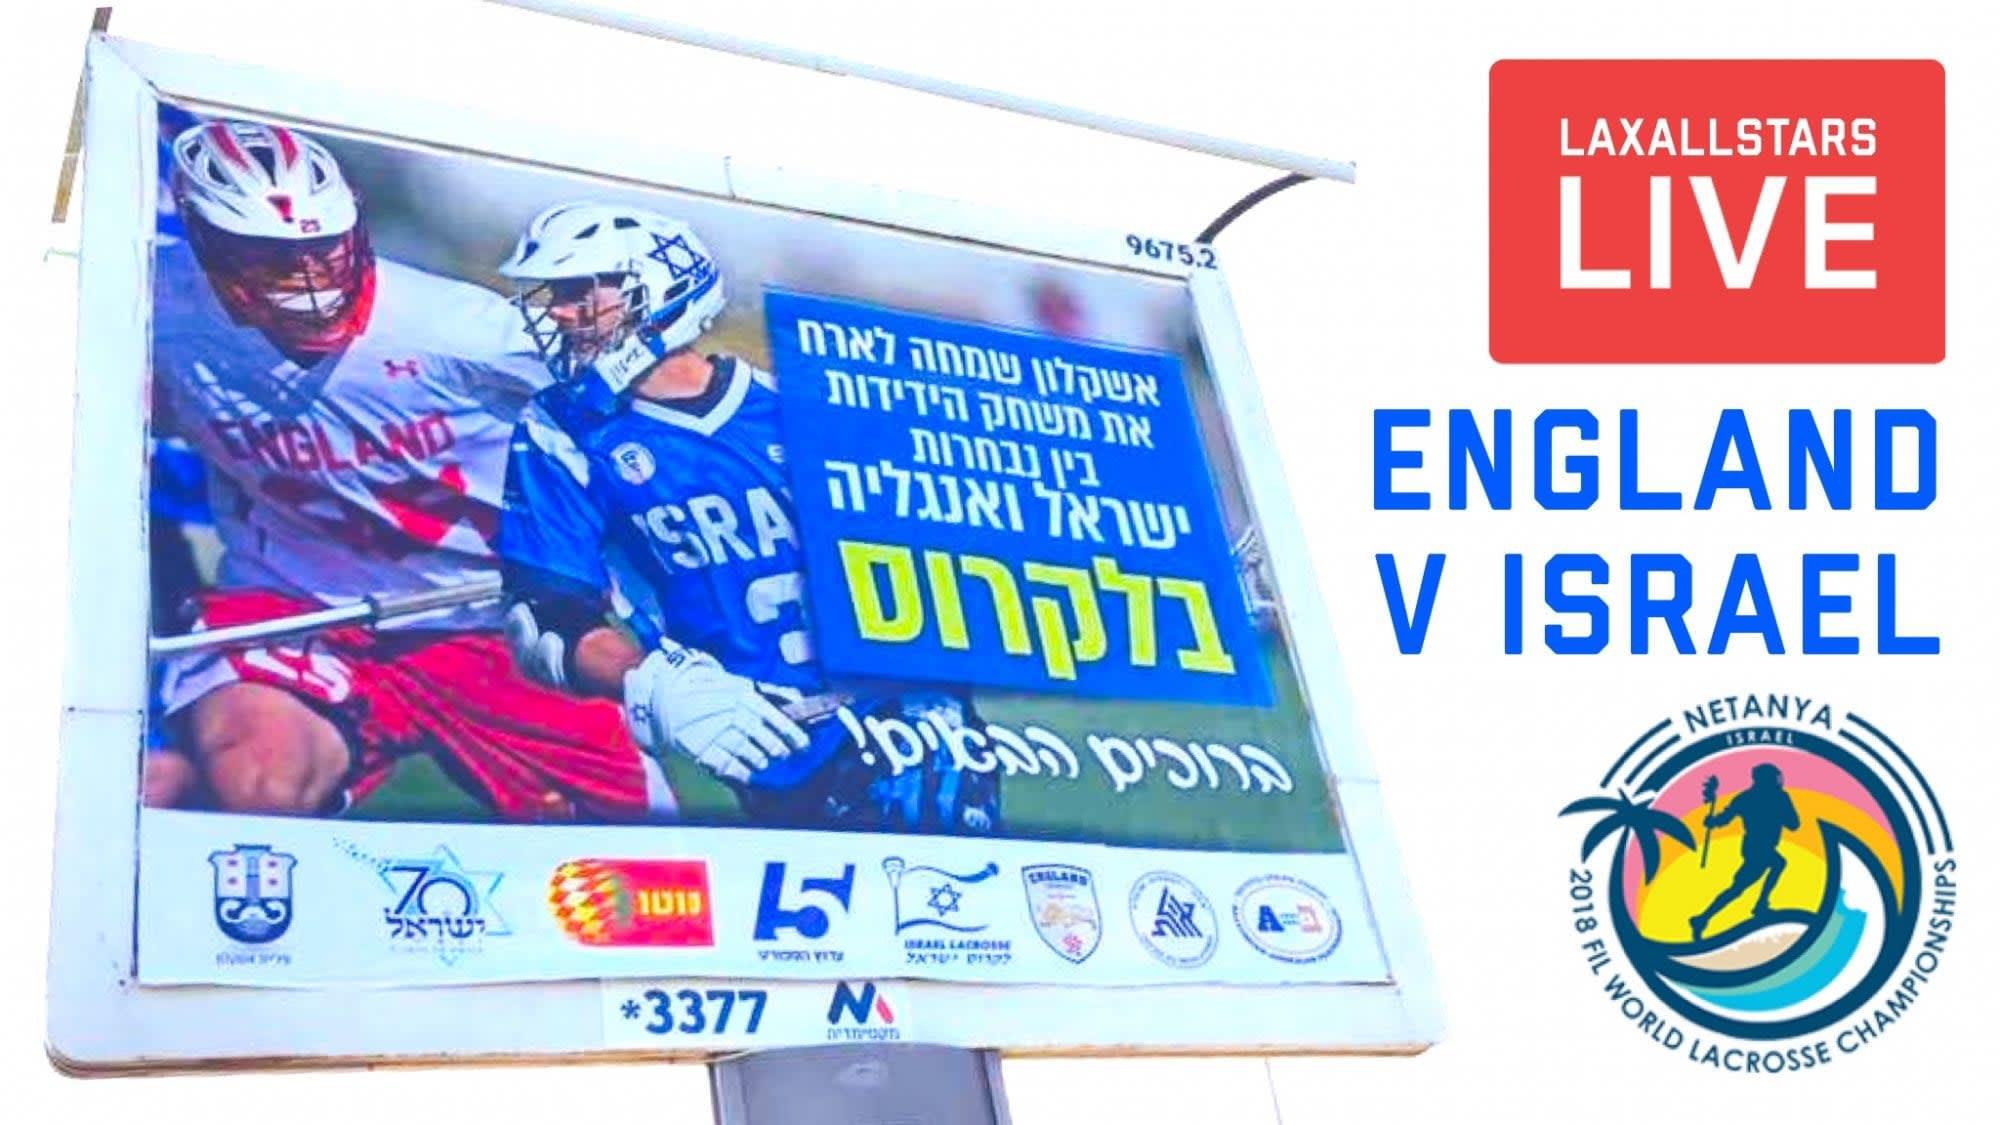 international lax game - england v israel